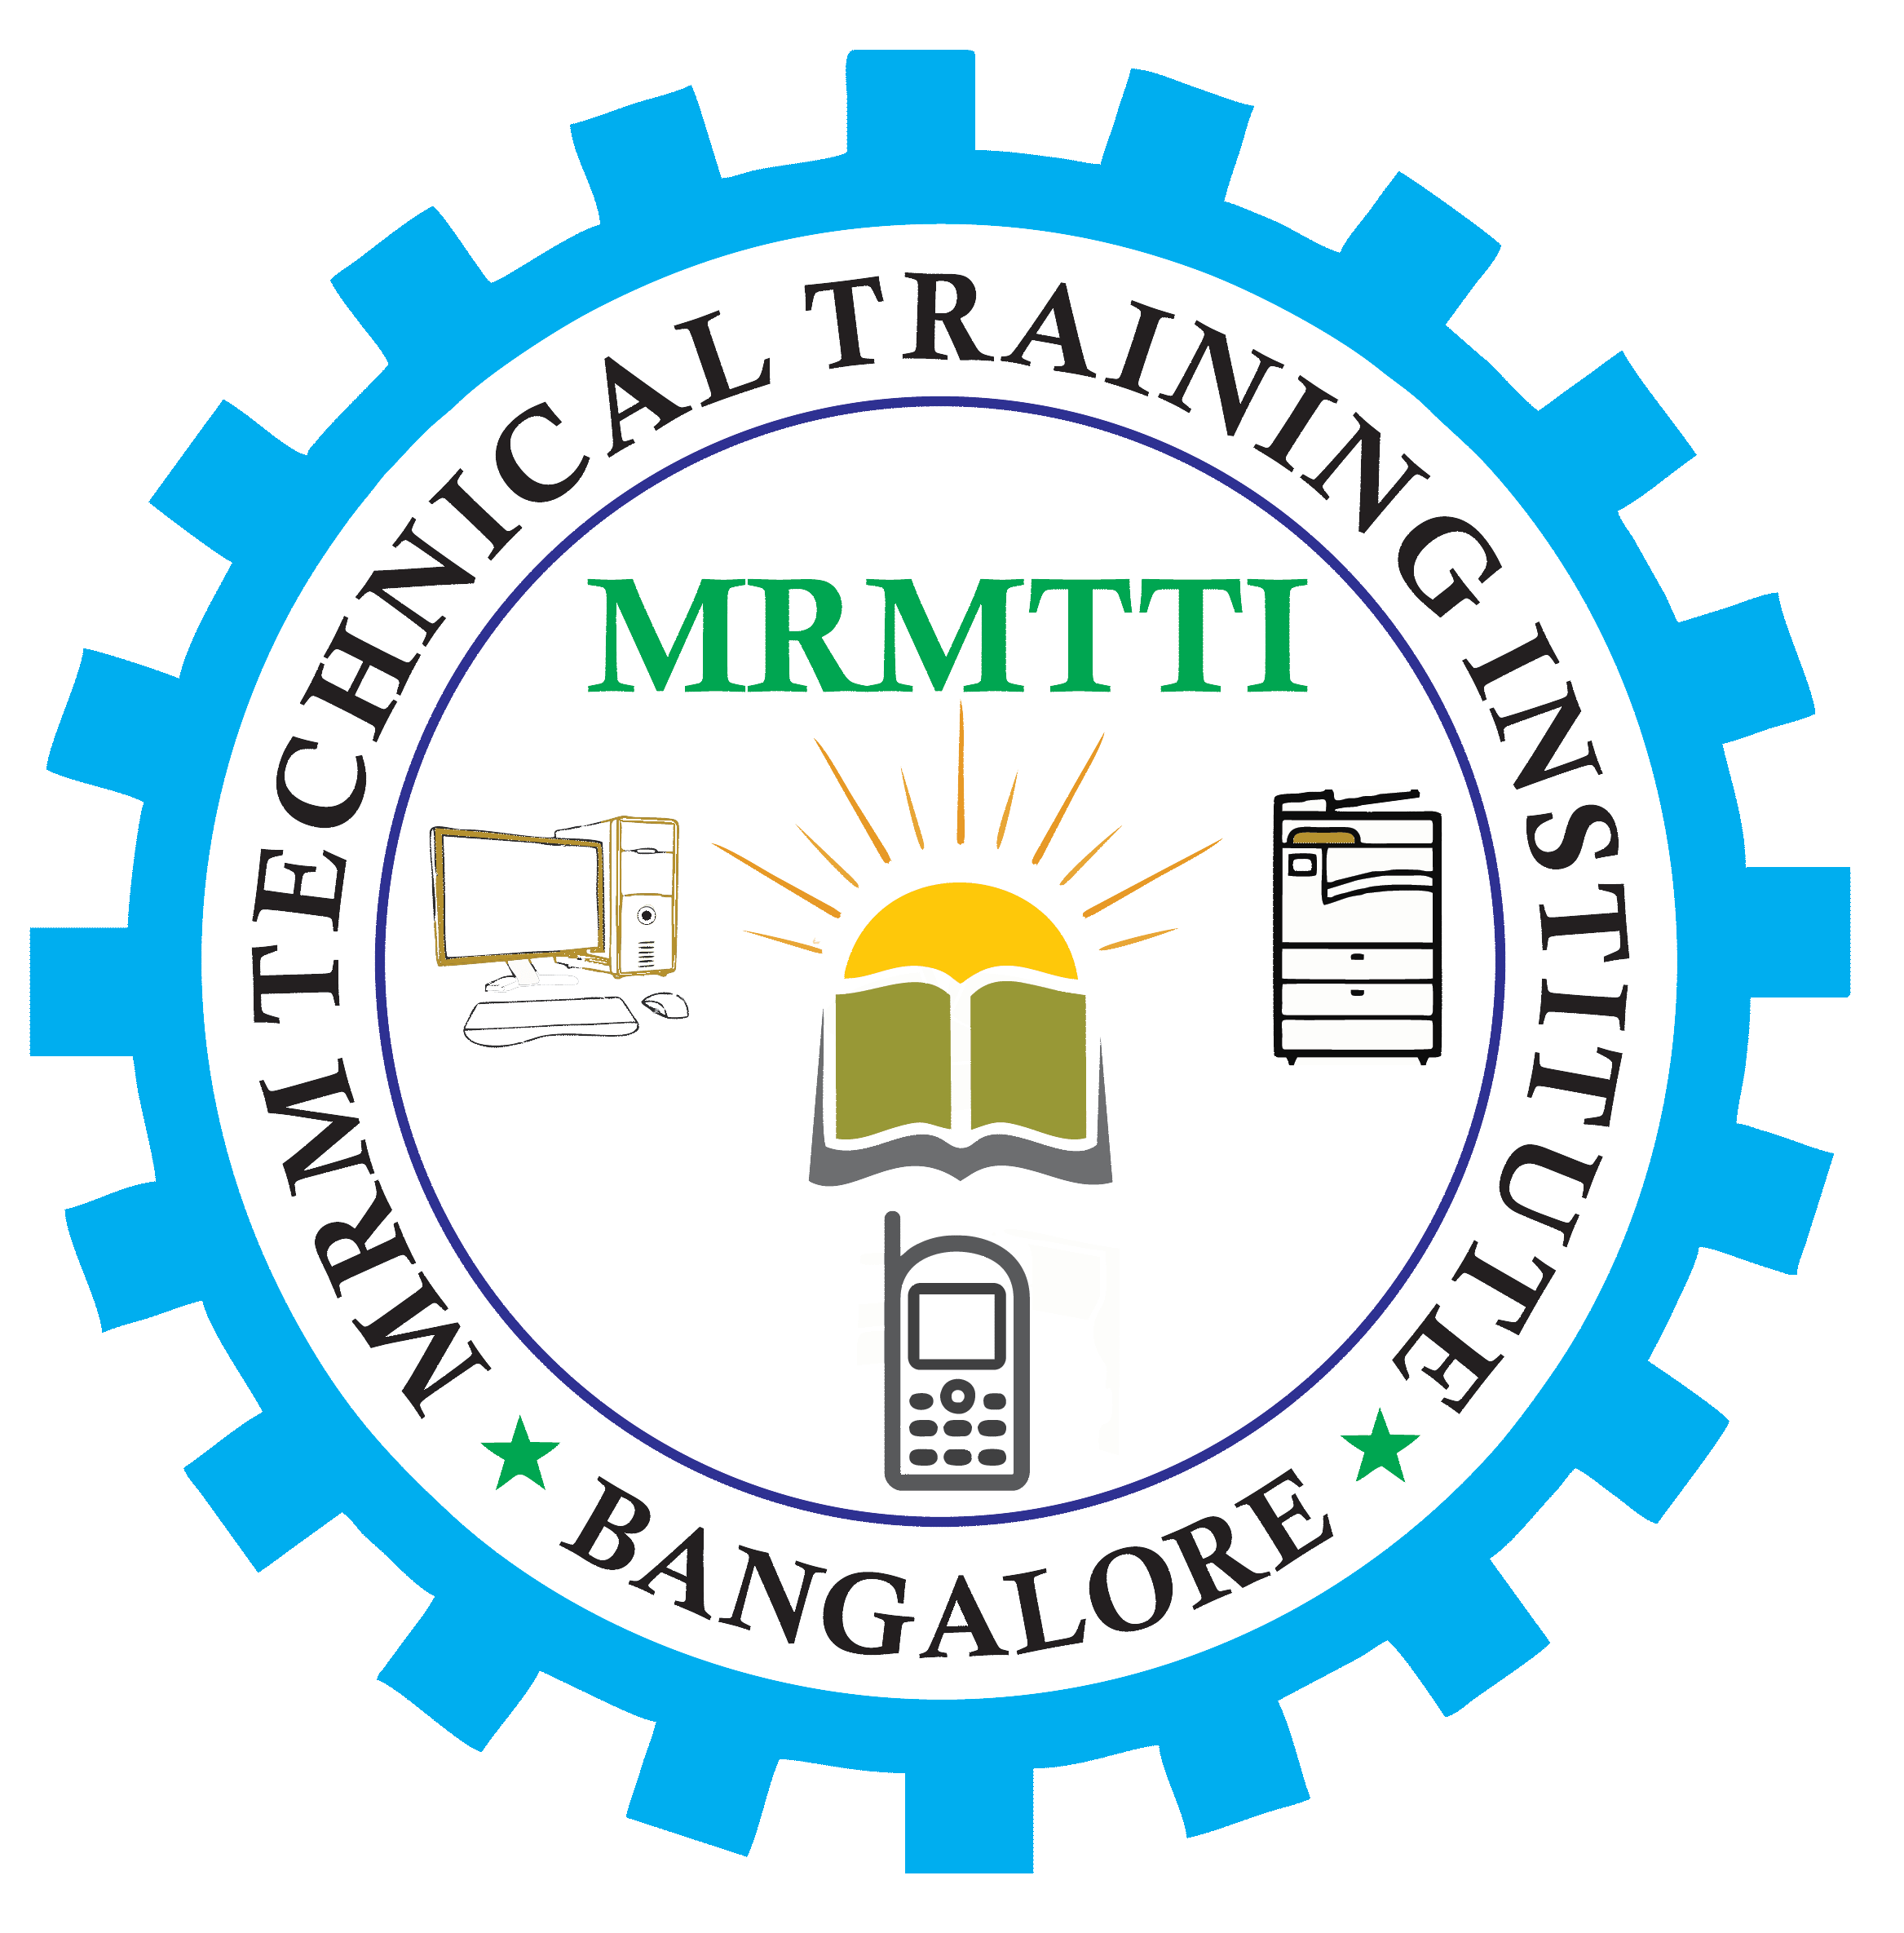 MRMTTI-MRM TECHNICAL TRAINING INSTITUTE